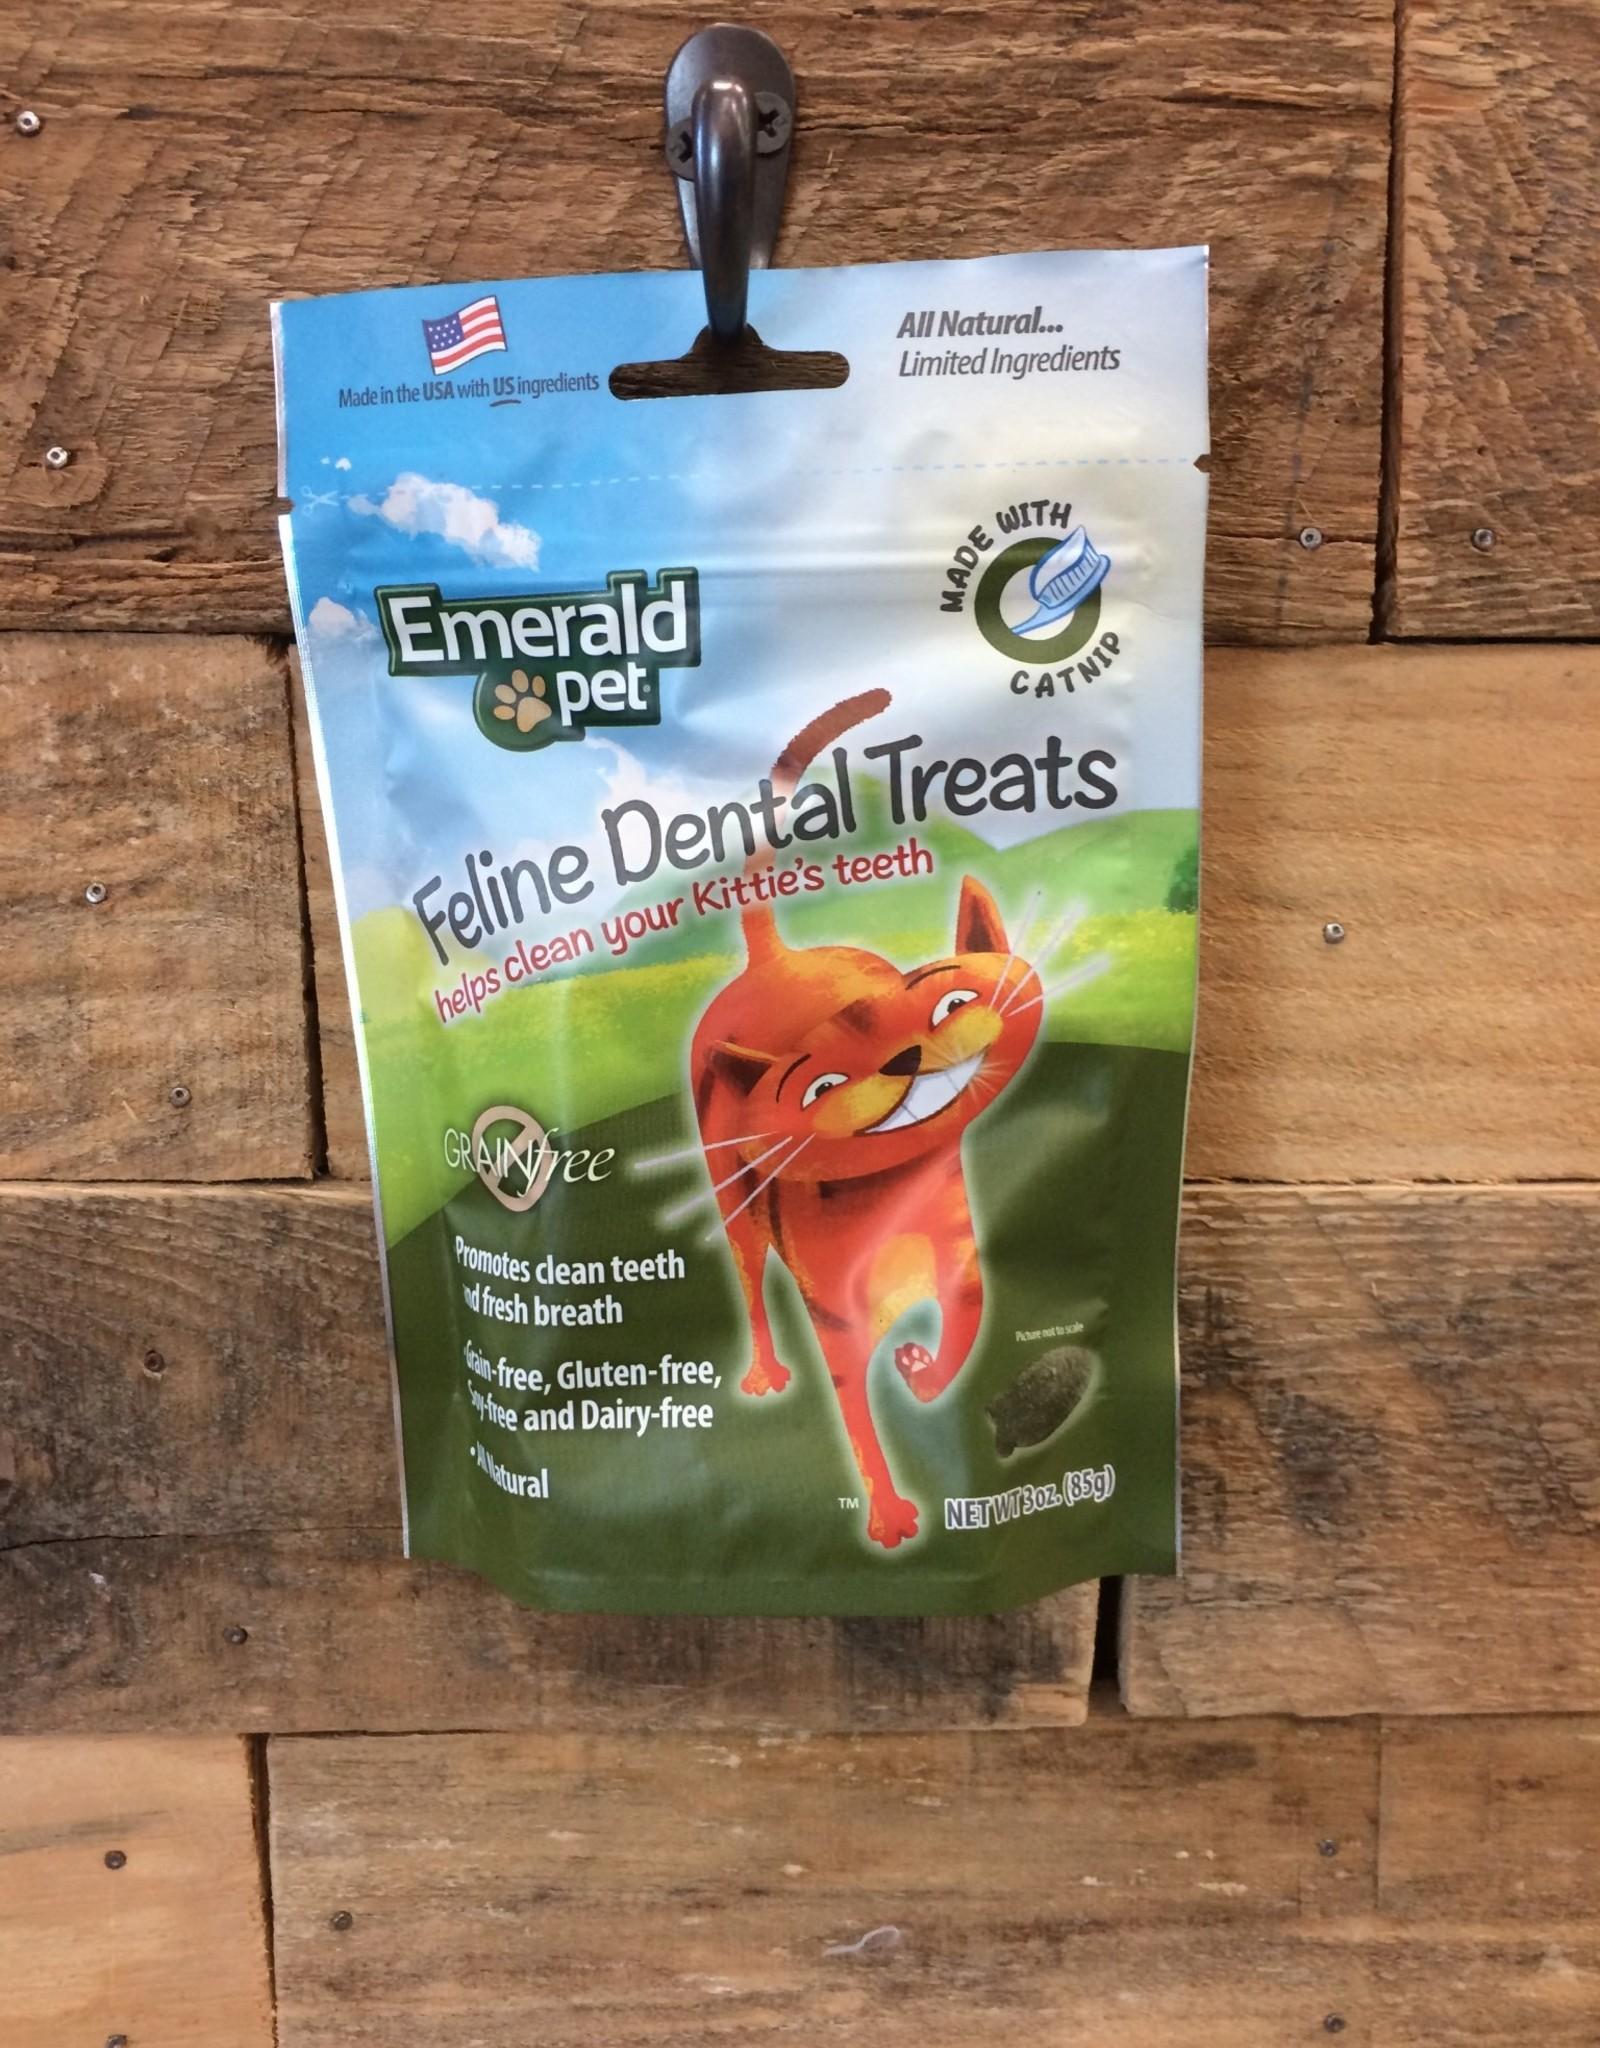 EMERALD PET 3 OZ. DENTAL CAT TREAT - CATNIP